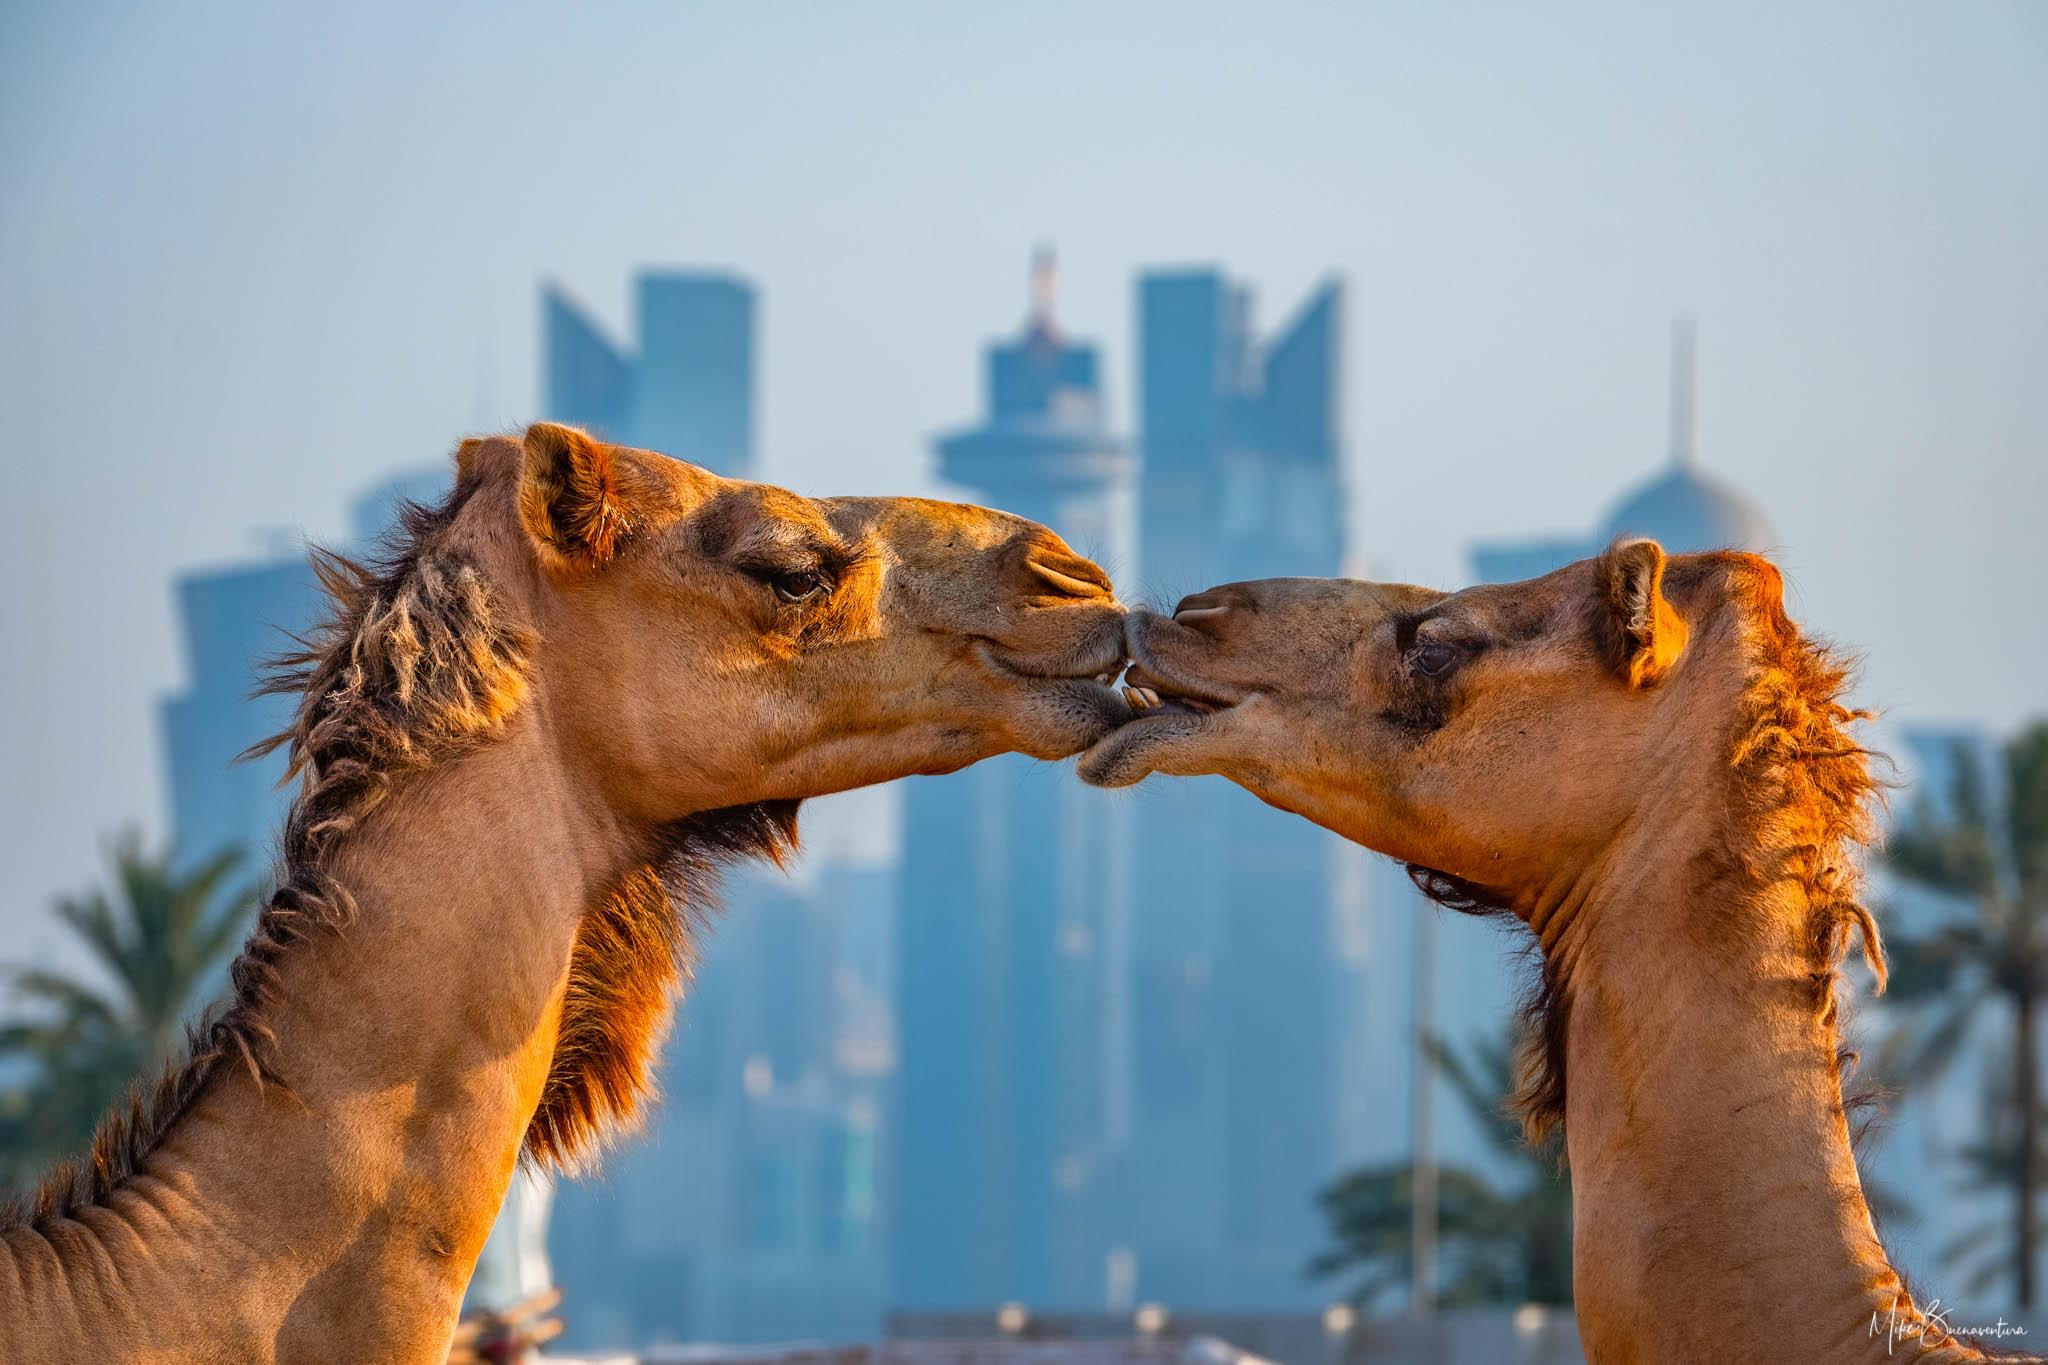 Souq Waqif Camel Station, Qatar